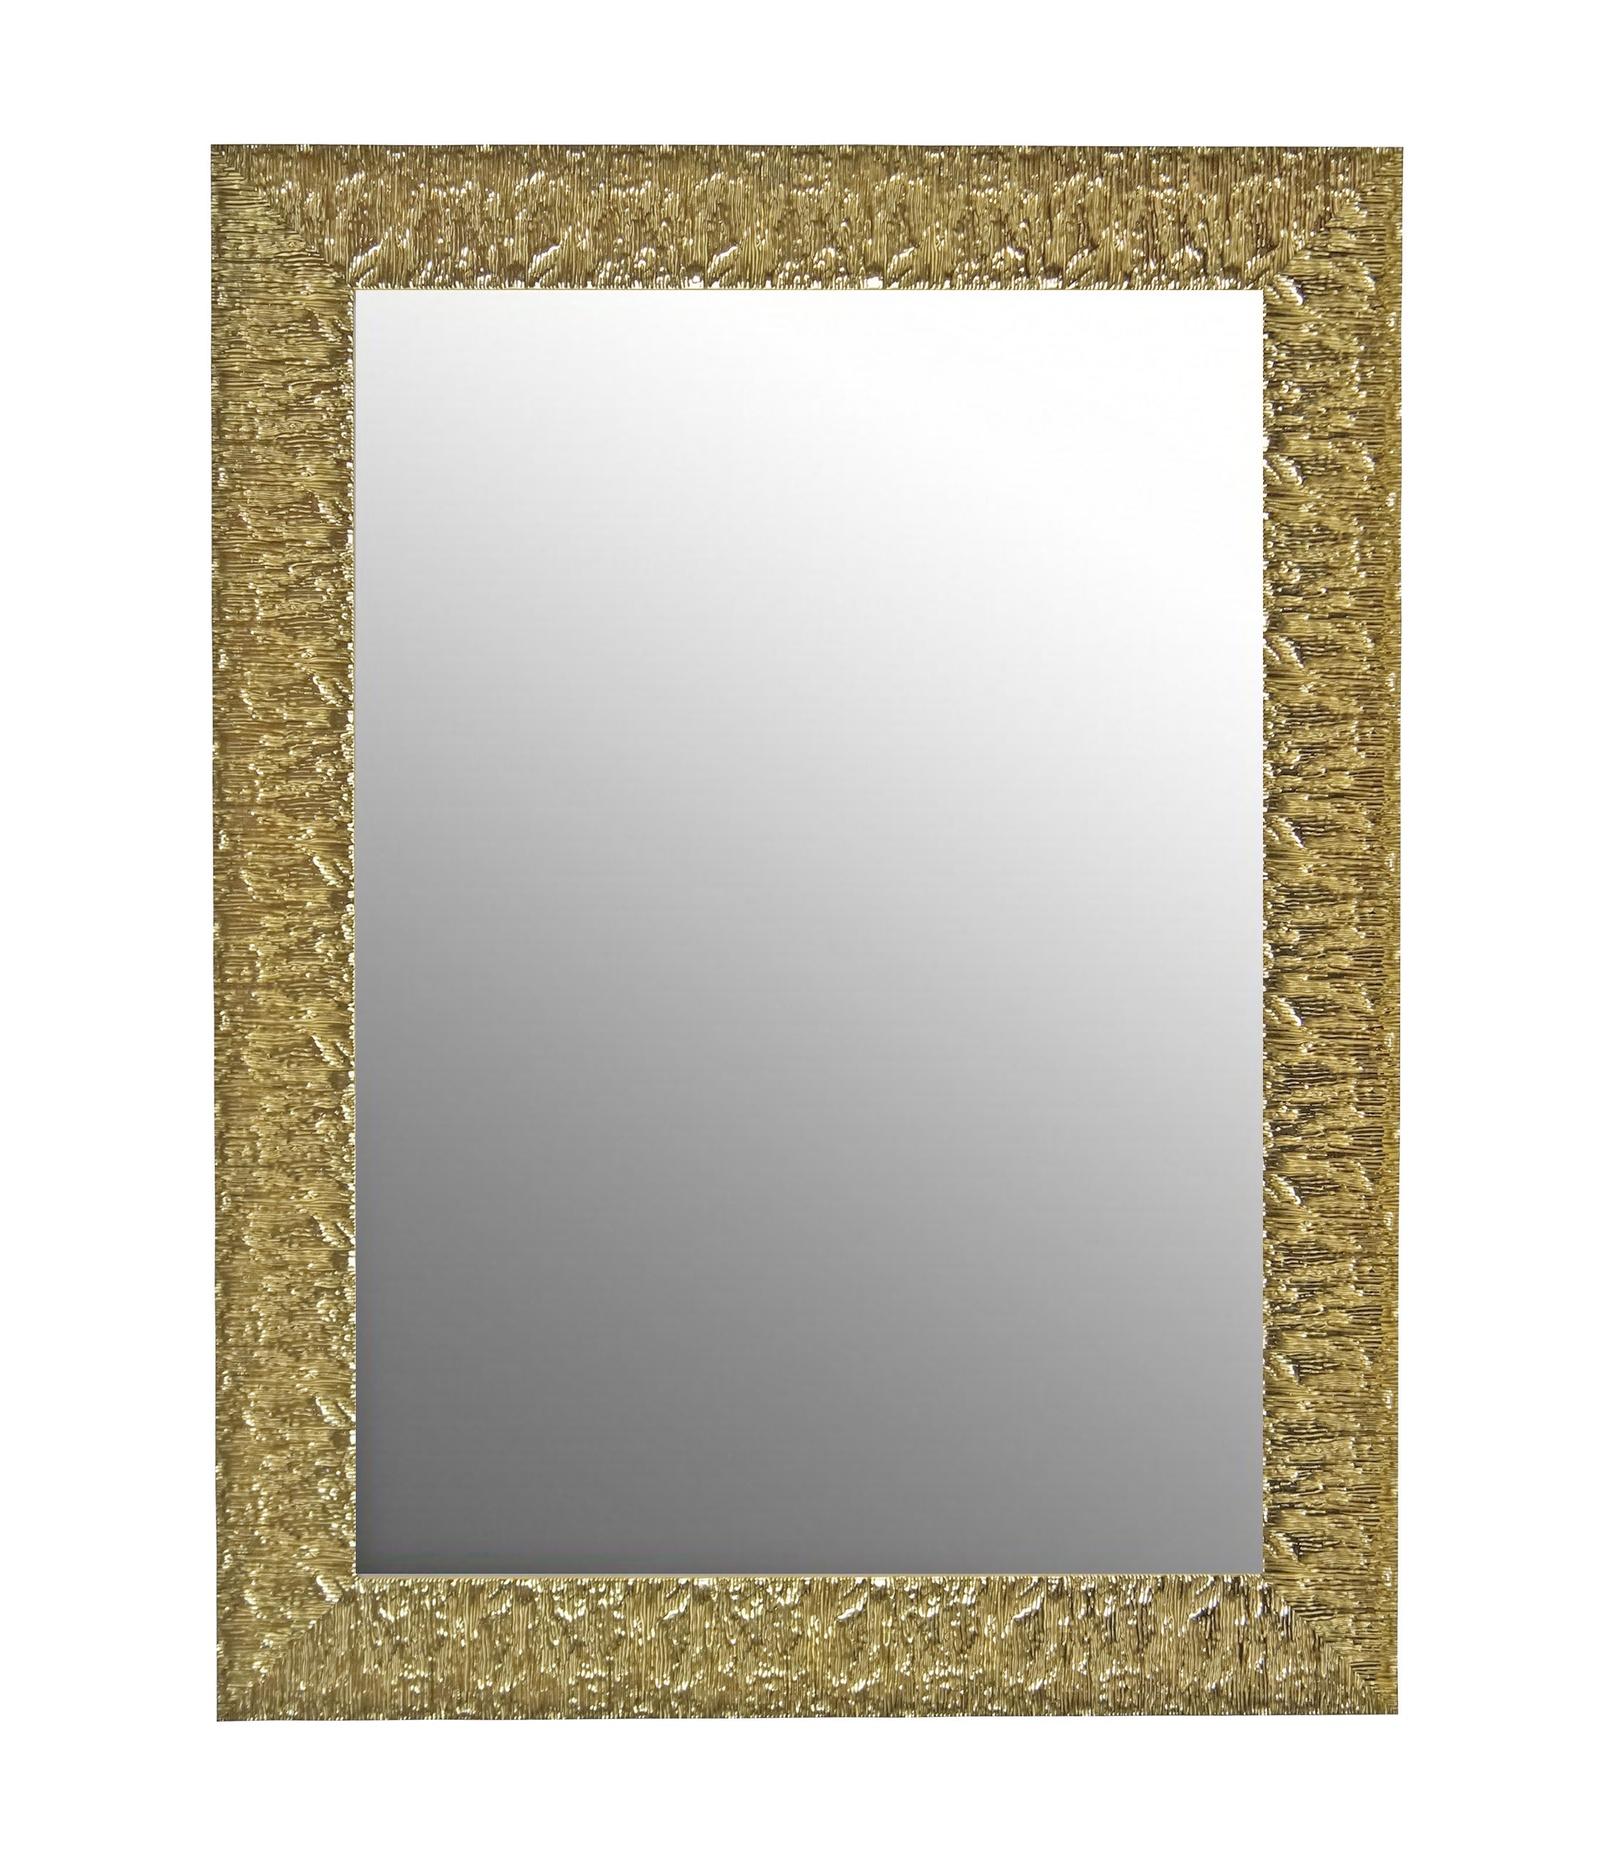 Зеркало интерьерное Мастер Рио Зеркало 30х40 Люкс-10/1 Мастер Рио